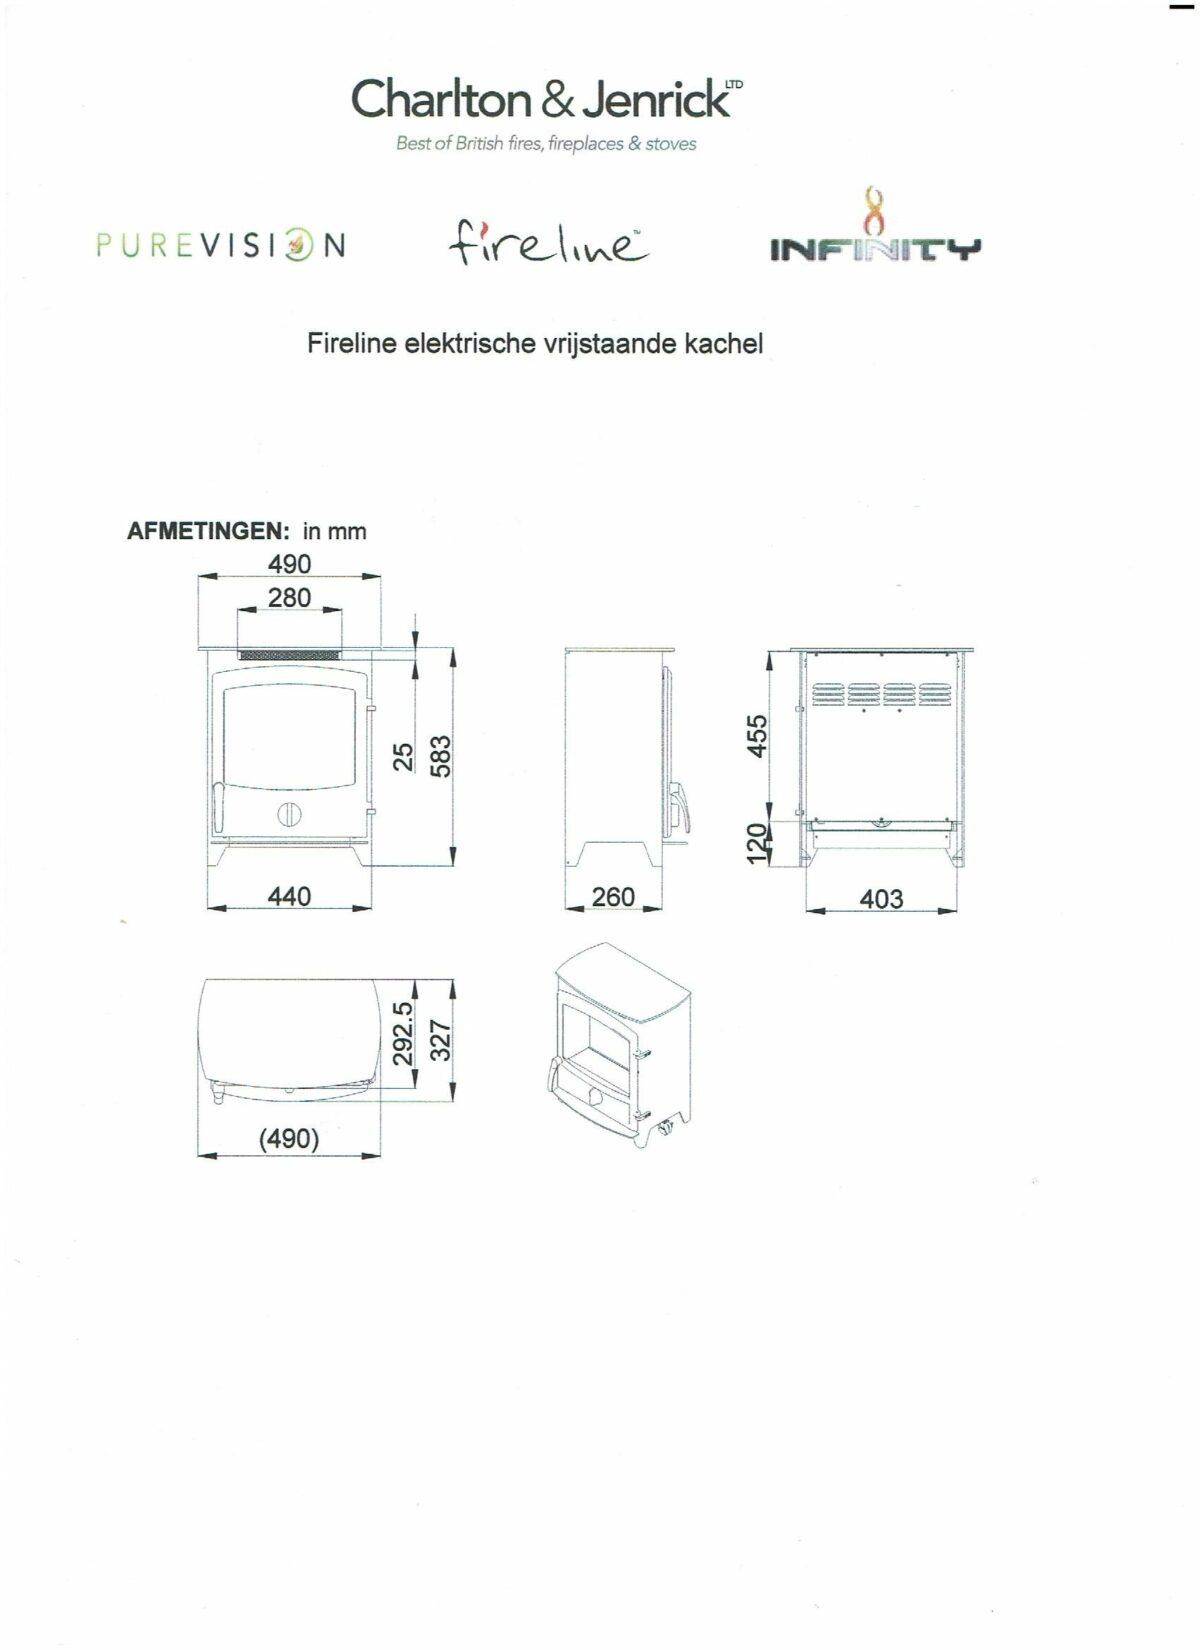 charlton-jenrick-fireline-fp-elektrische-kachel-rechthoekige-deur-line_image